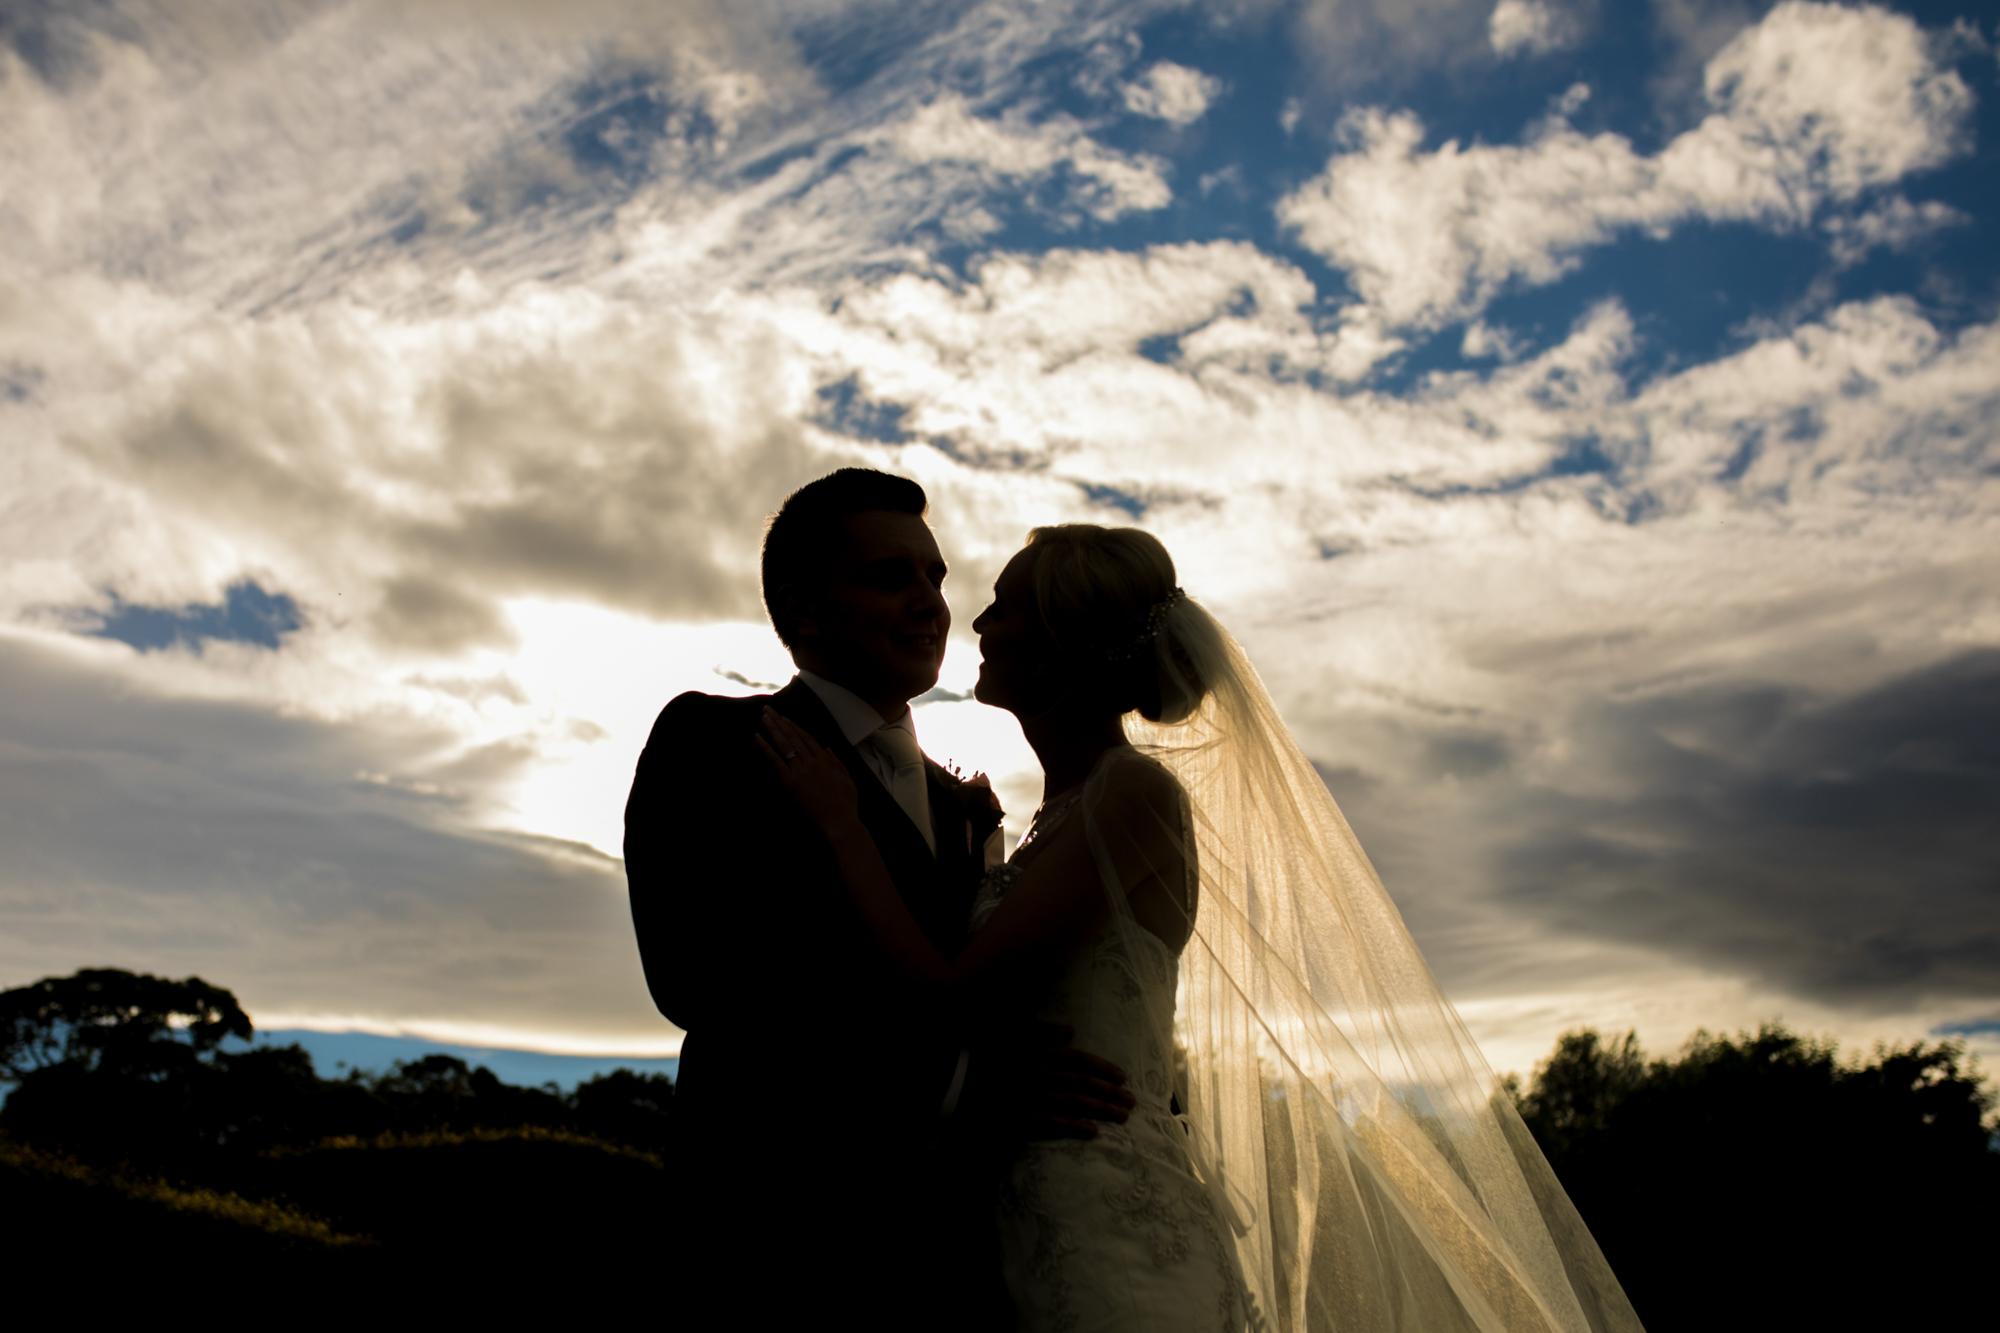 Headlam hall wedding photographer-2.jpg